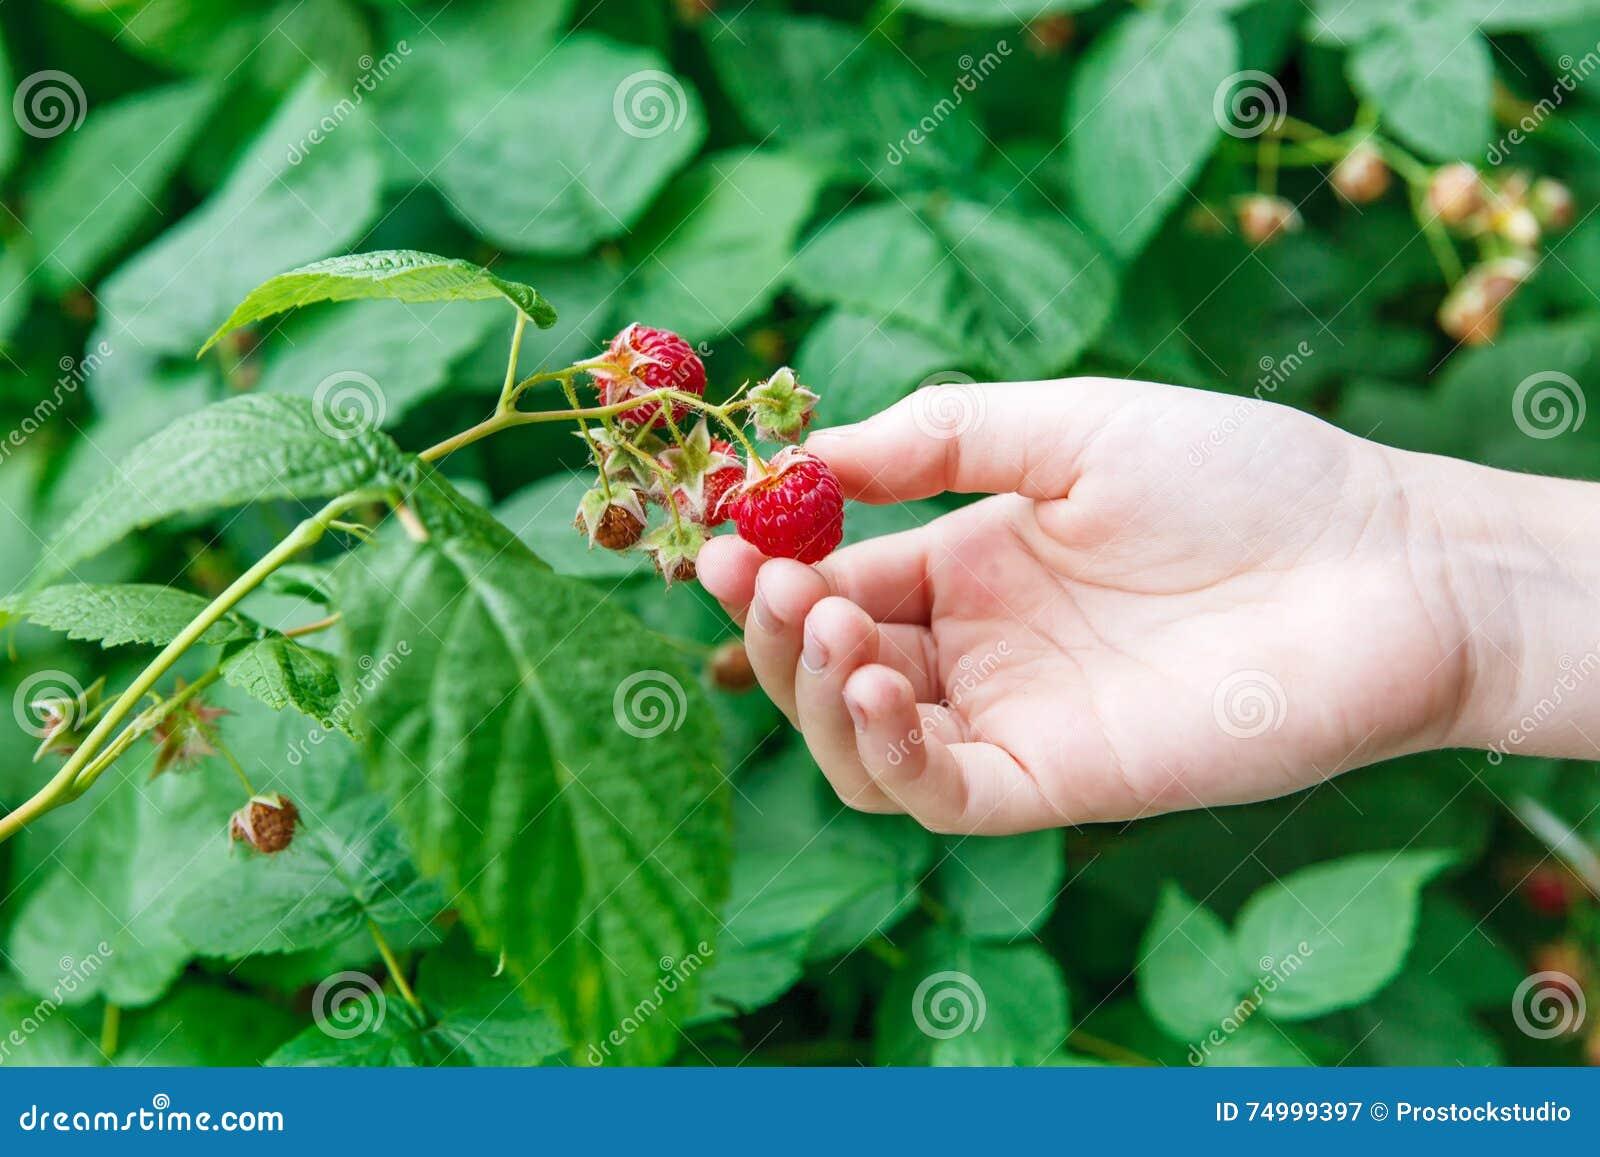 Hand gather red ripe raspberries on a bush